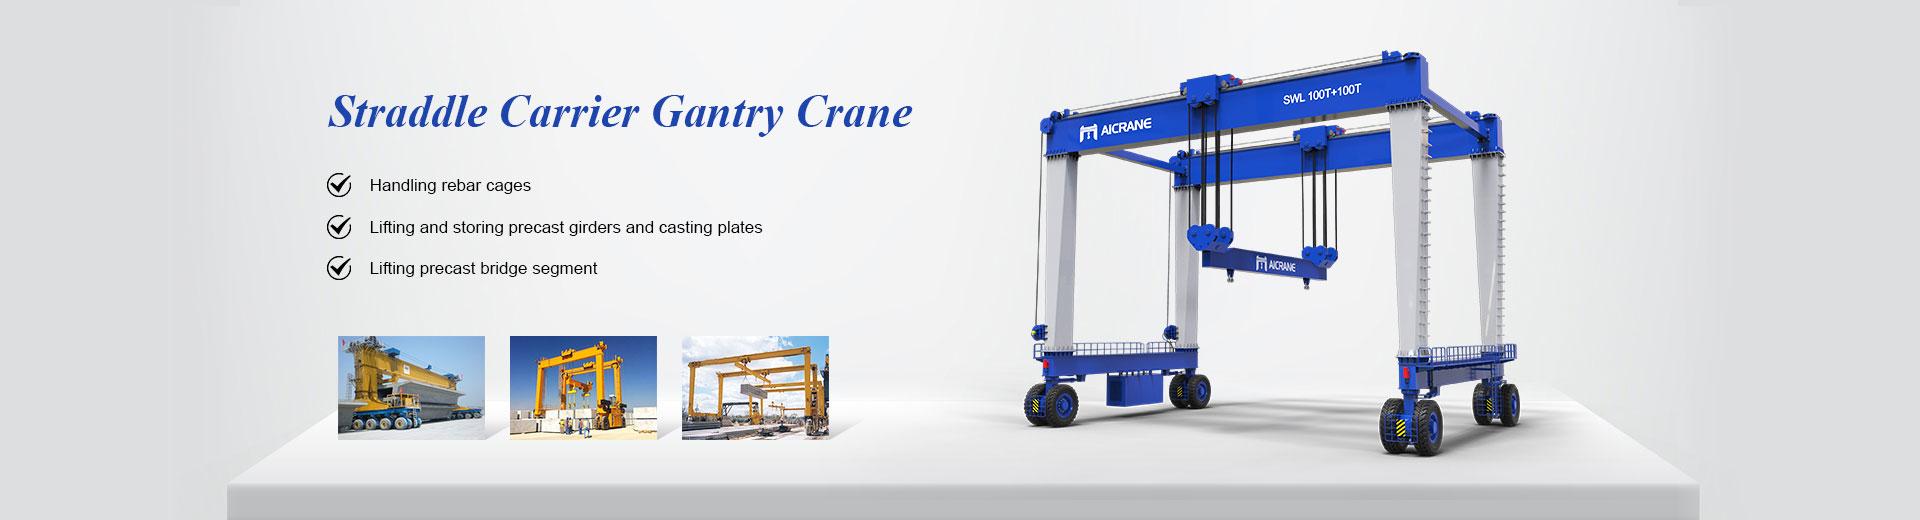 straddle-carrier-mobile-gantry-crane-1